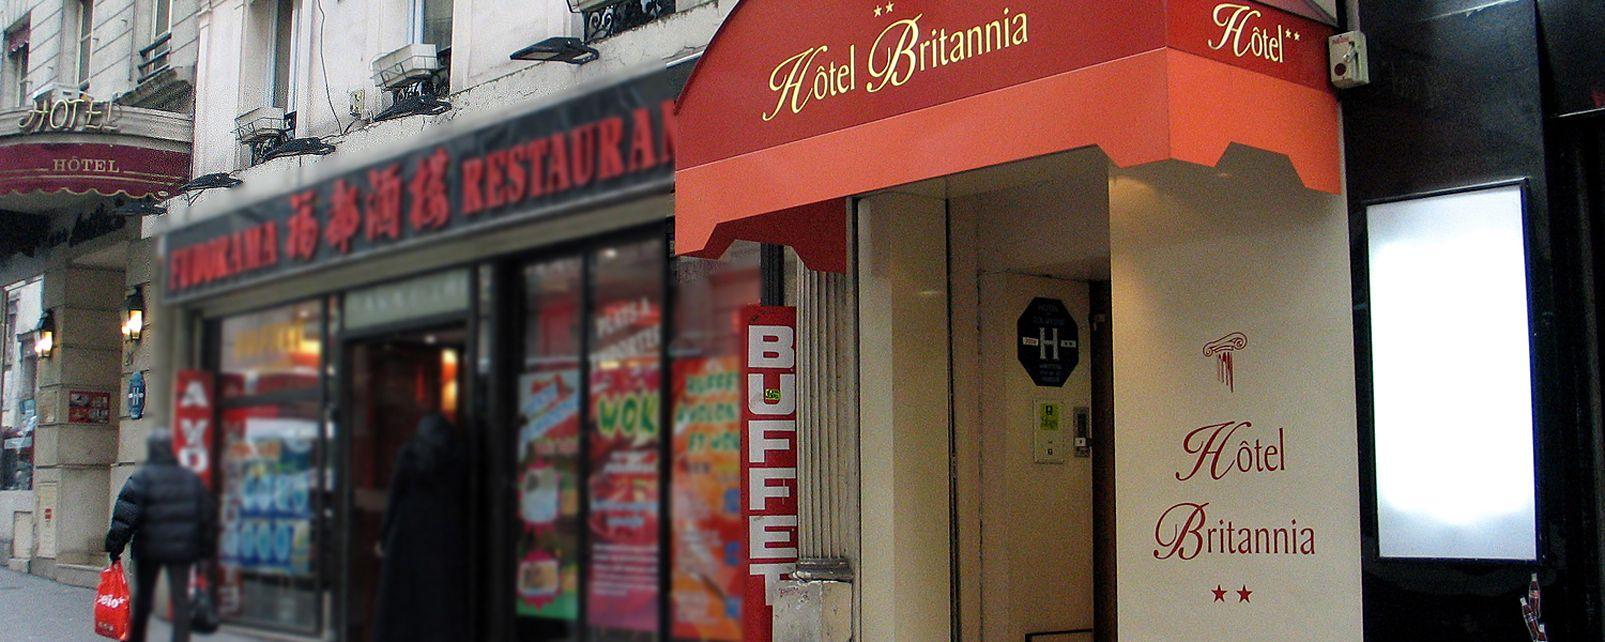 Hotel Logis De France Britannia